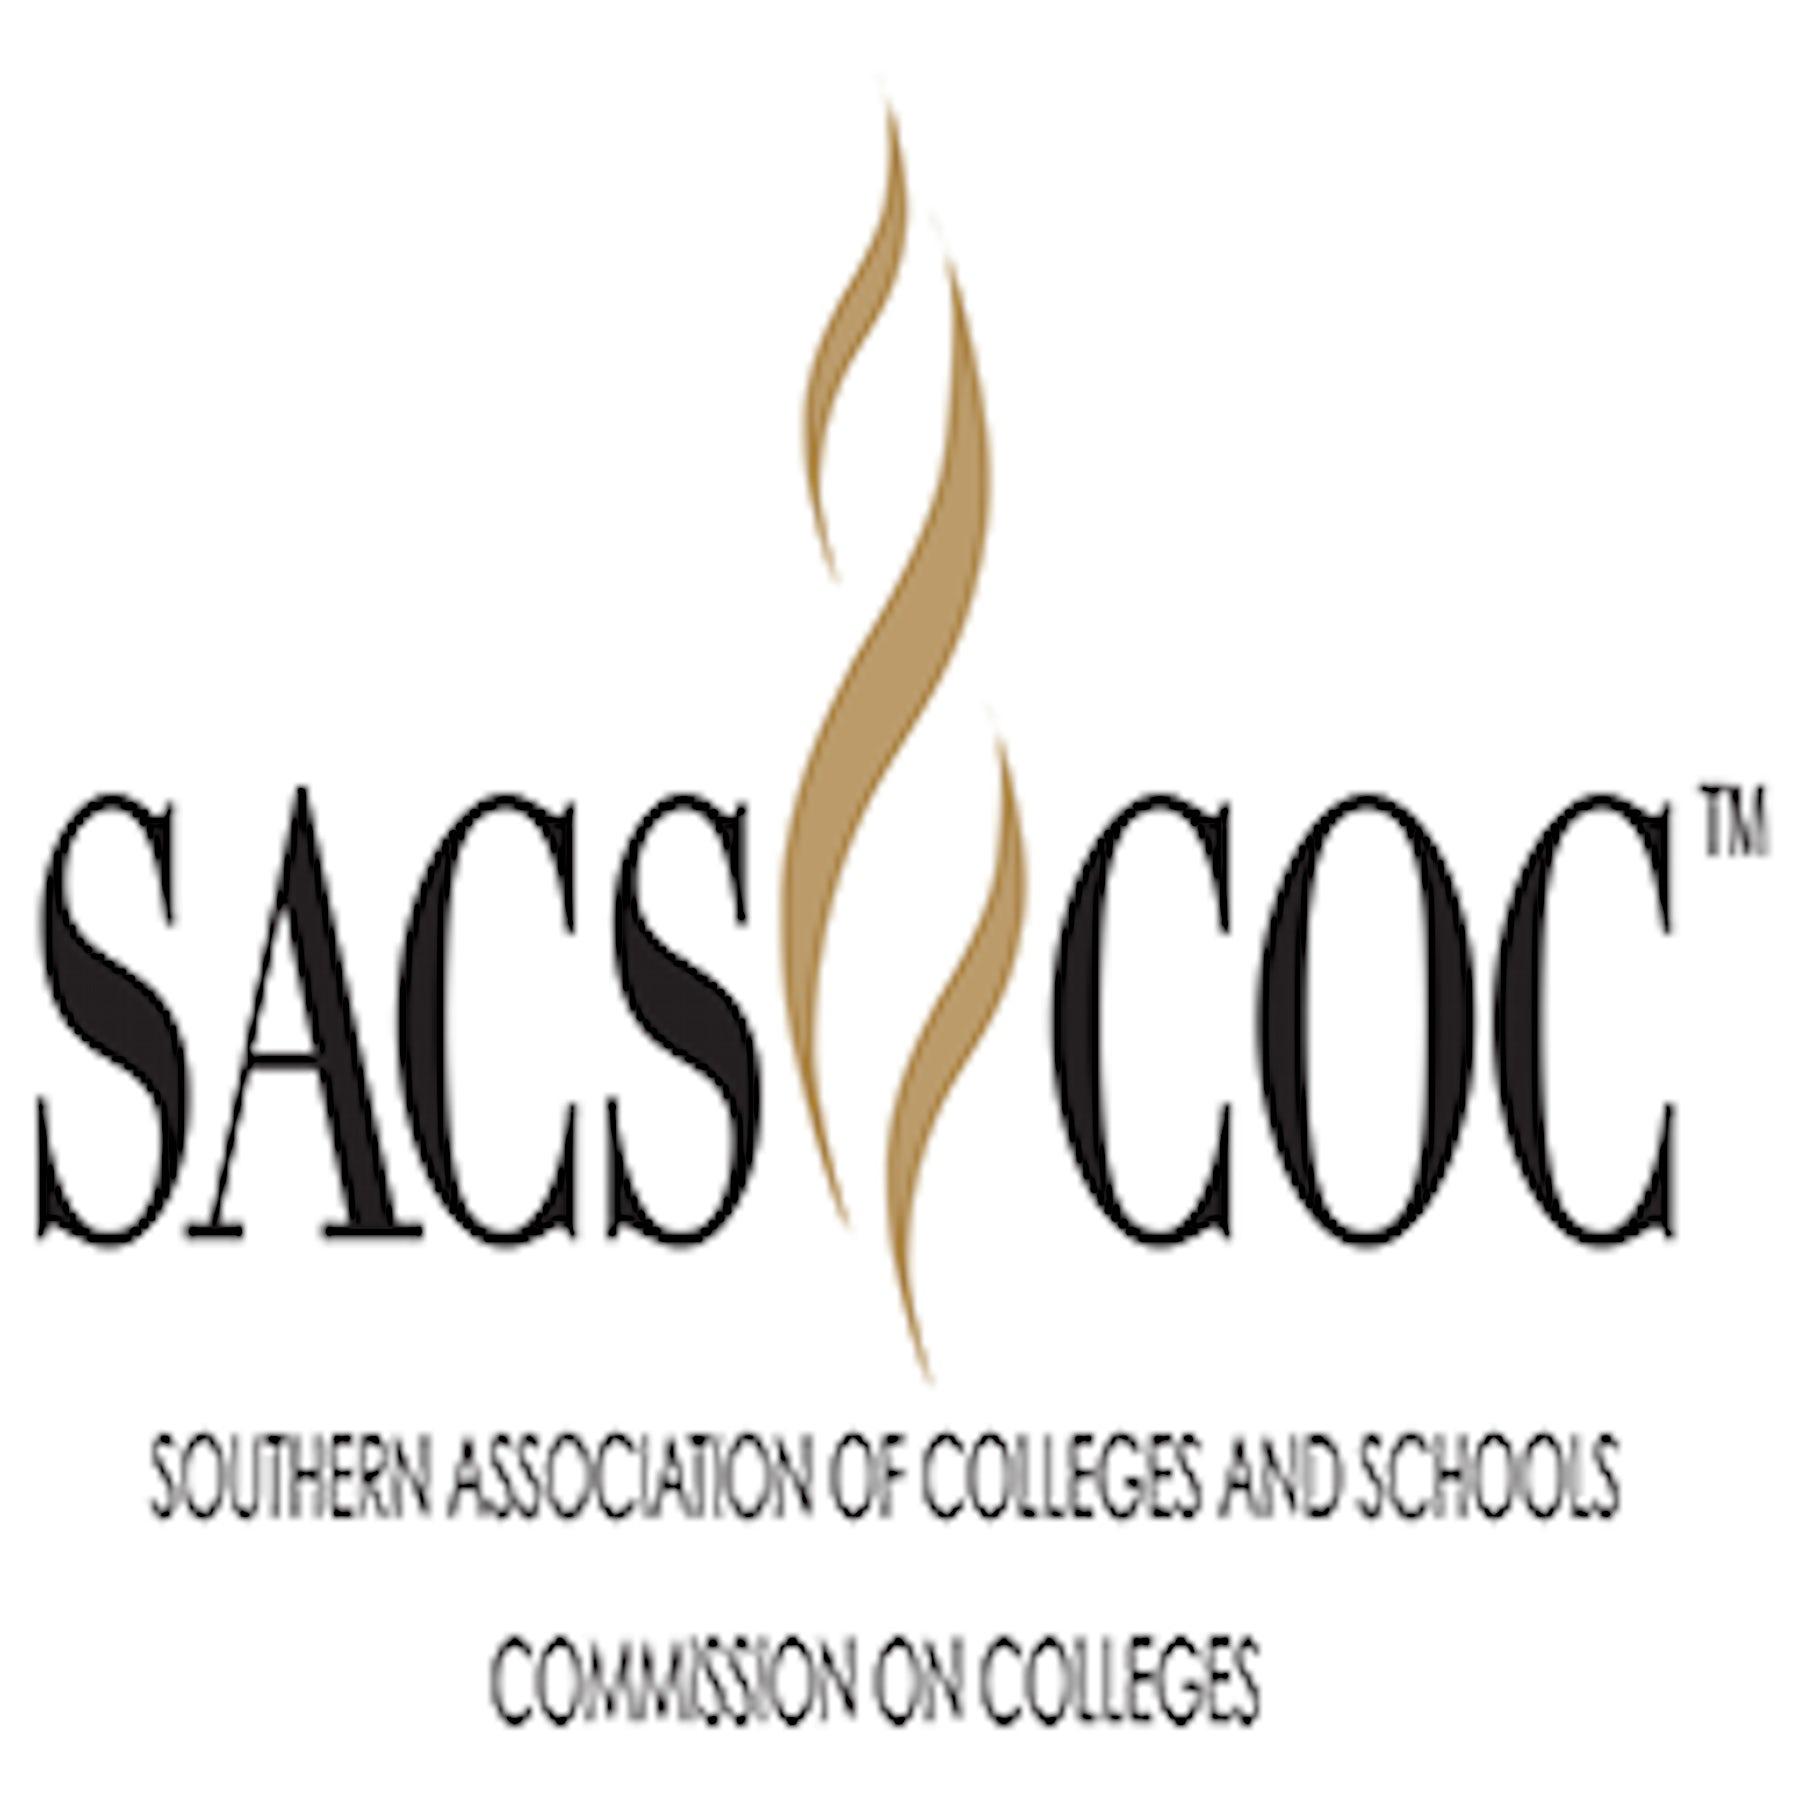 2021 SACSCOC Annual Meeting Logo